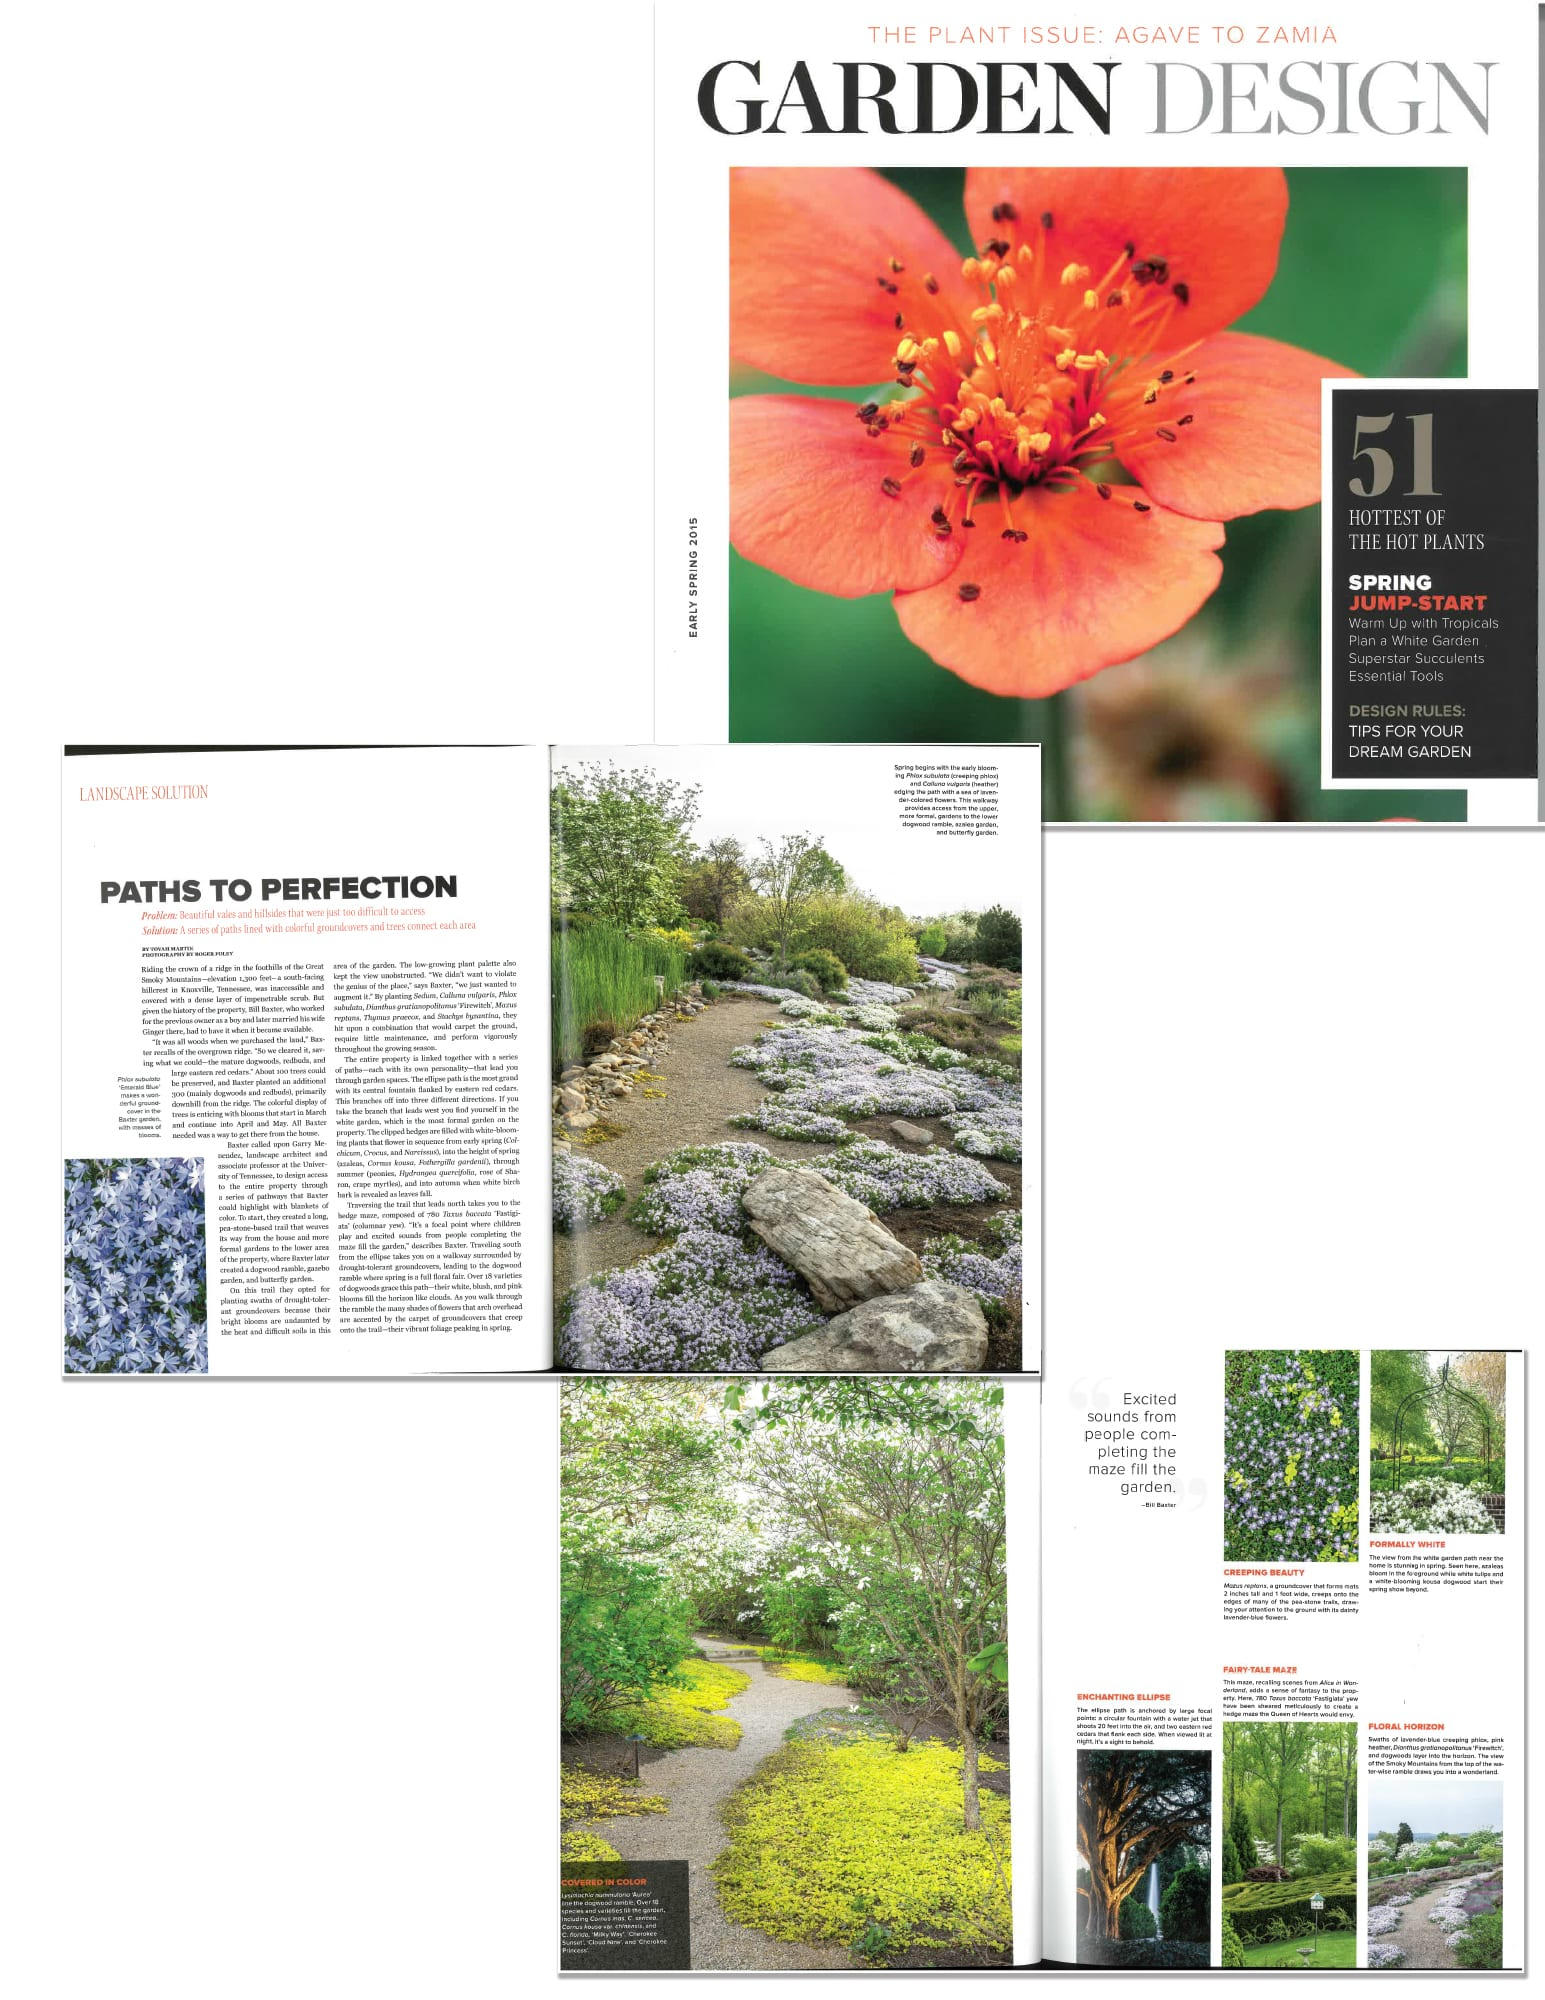 Baxter Gardens Southern Living magazine feature